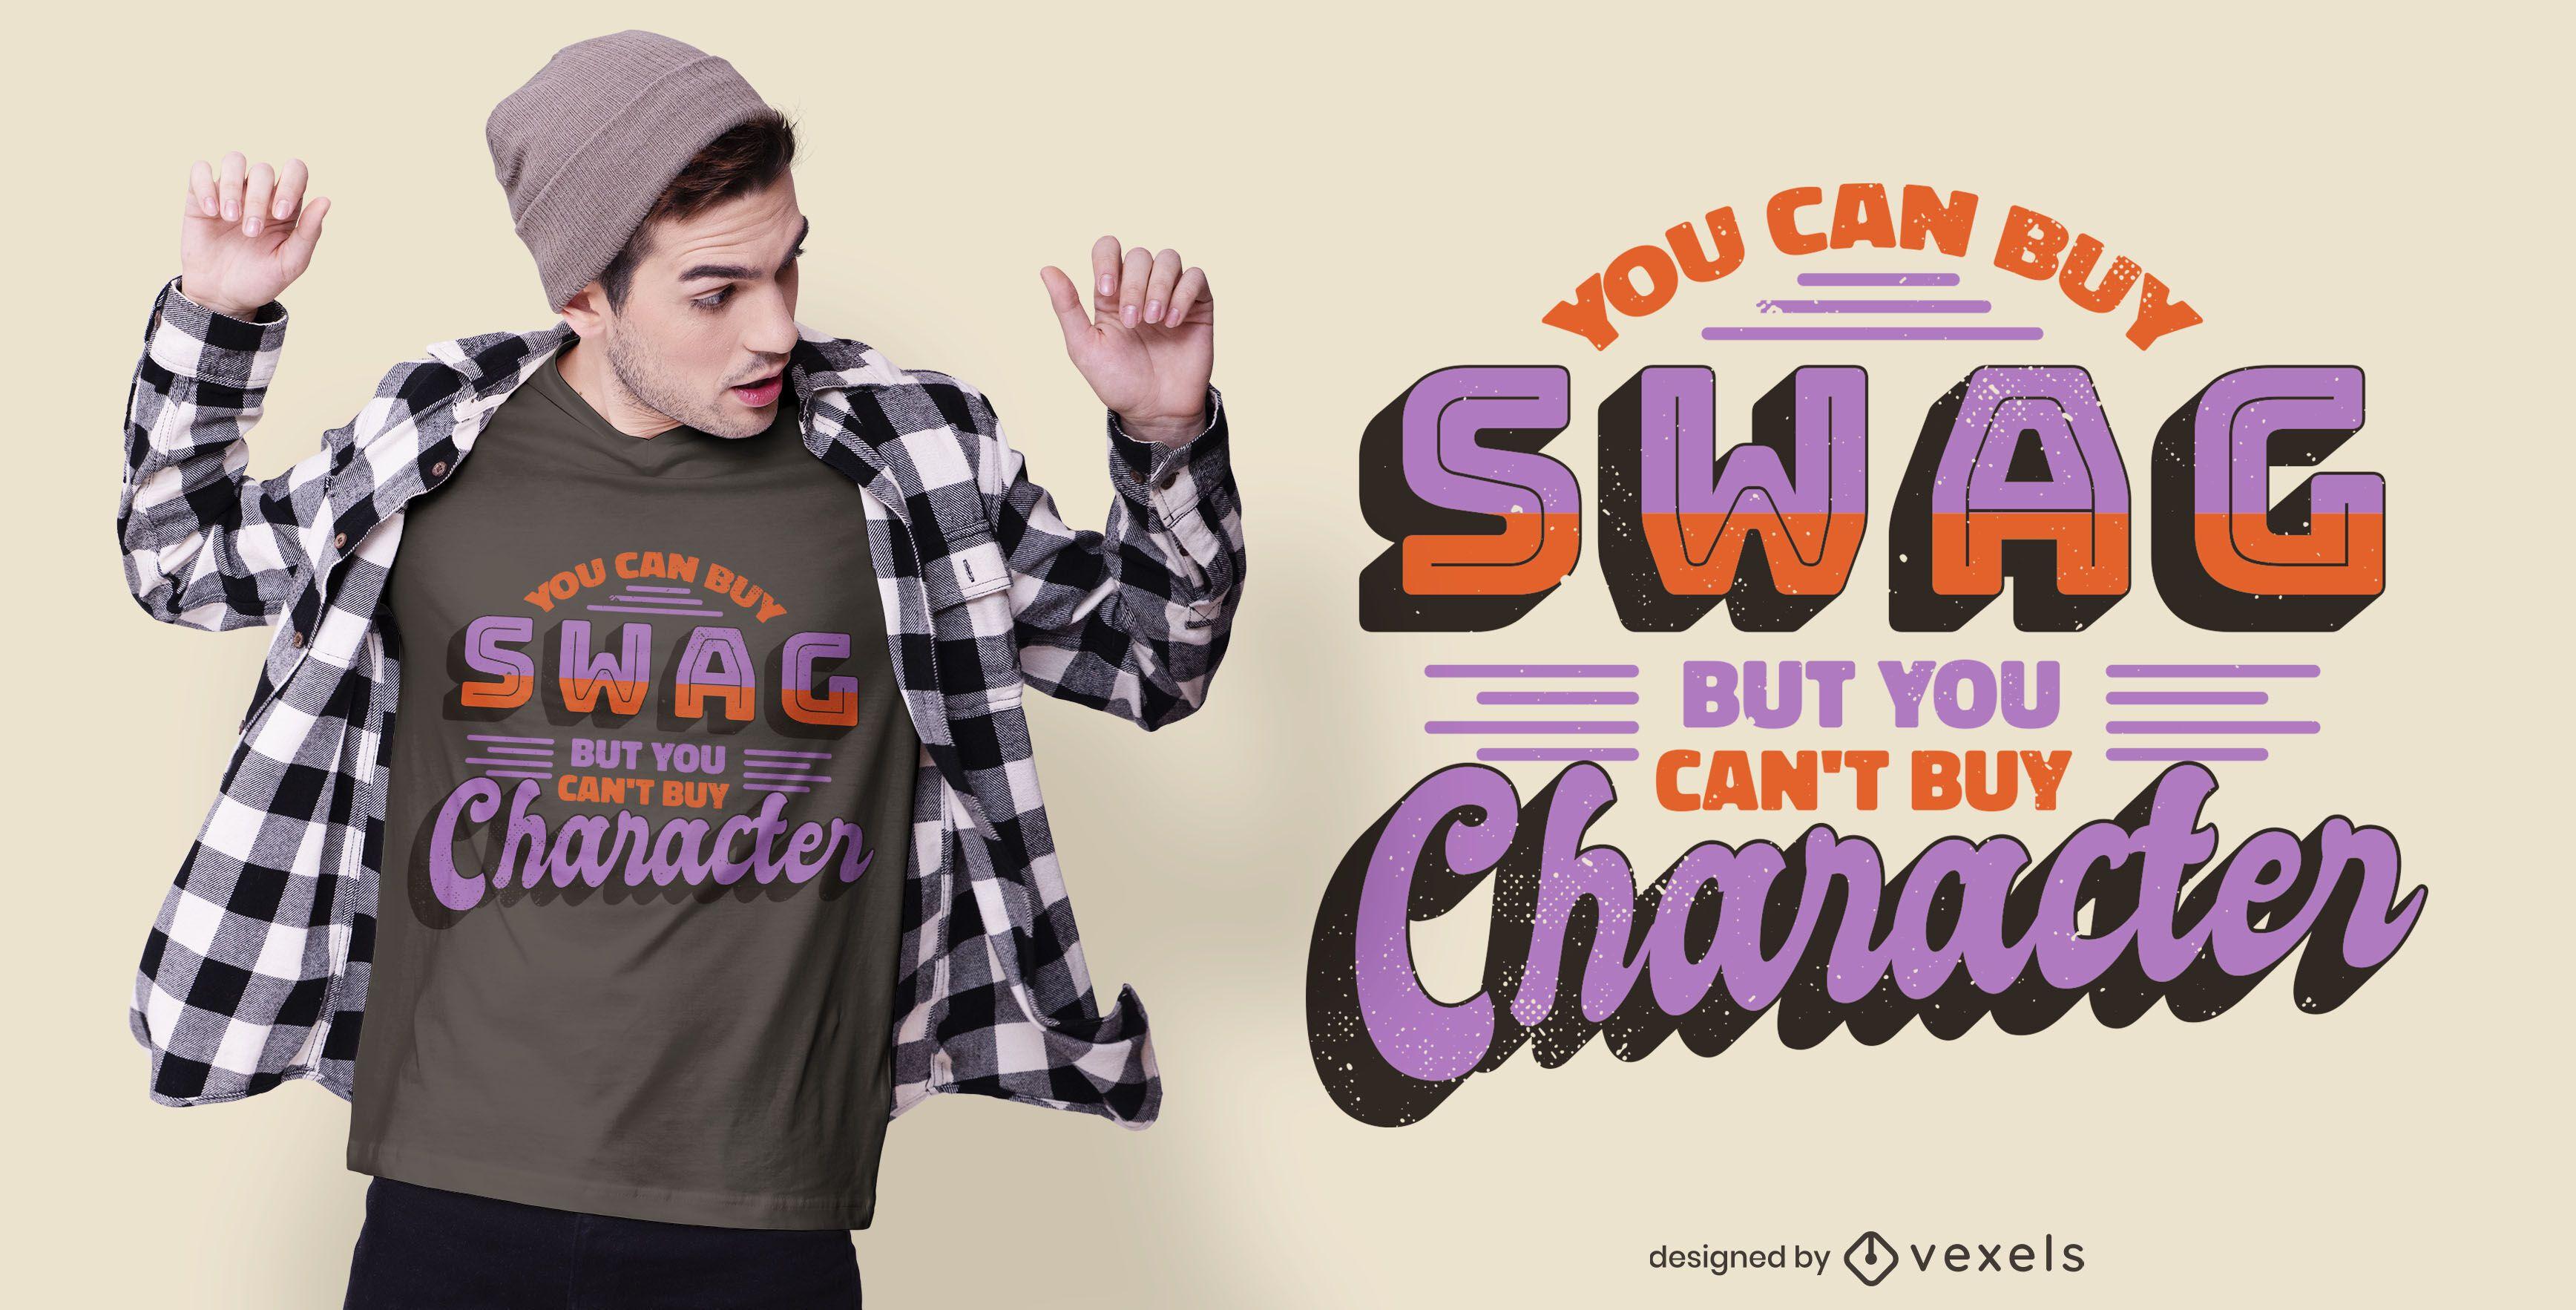 Swag character t-shirt design